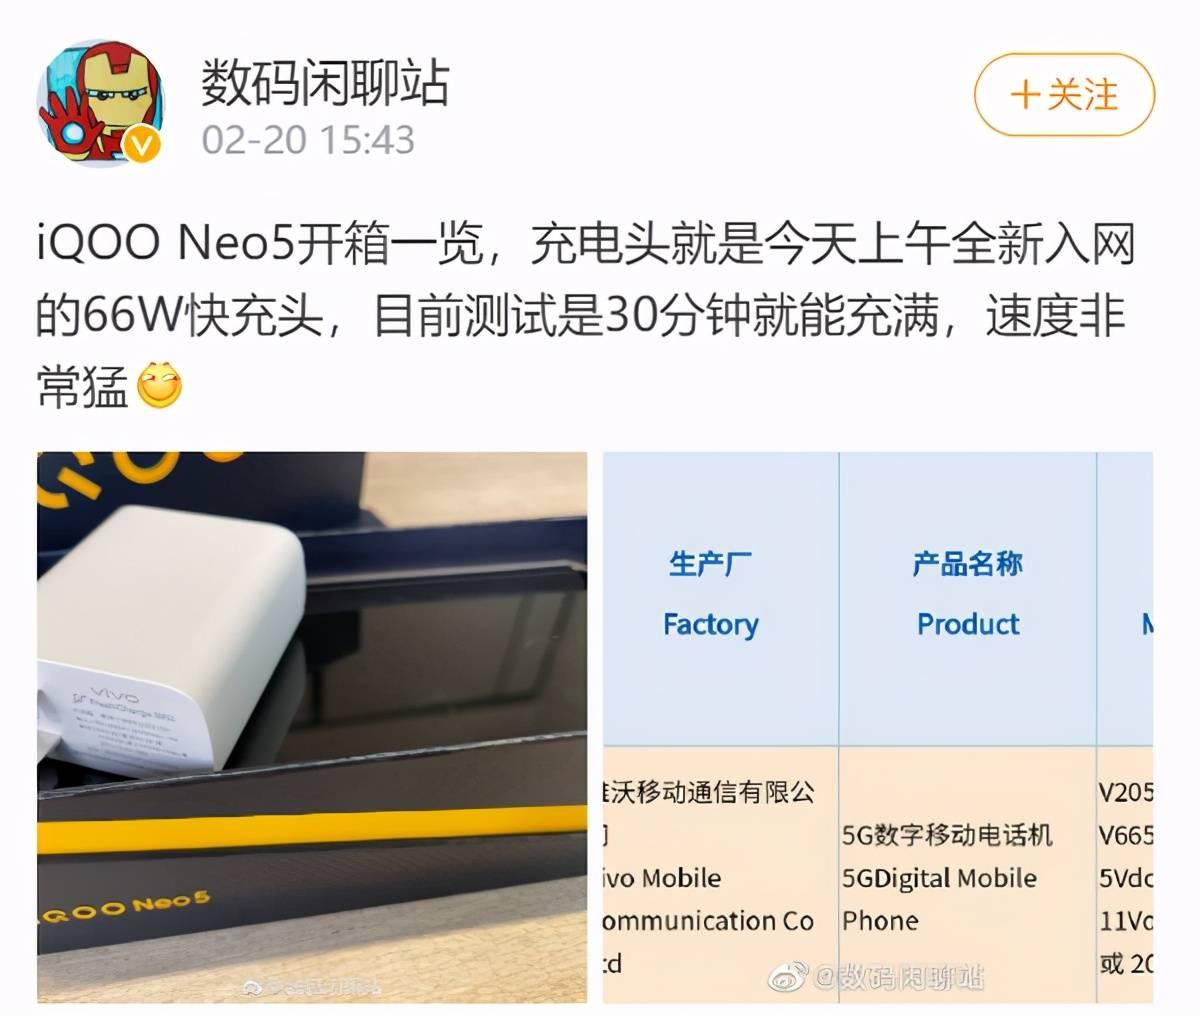 iQOO又双叒叕有新机曝光了,这次被热议的是快充